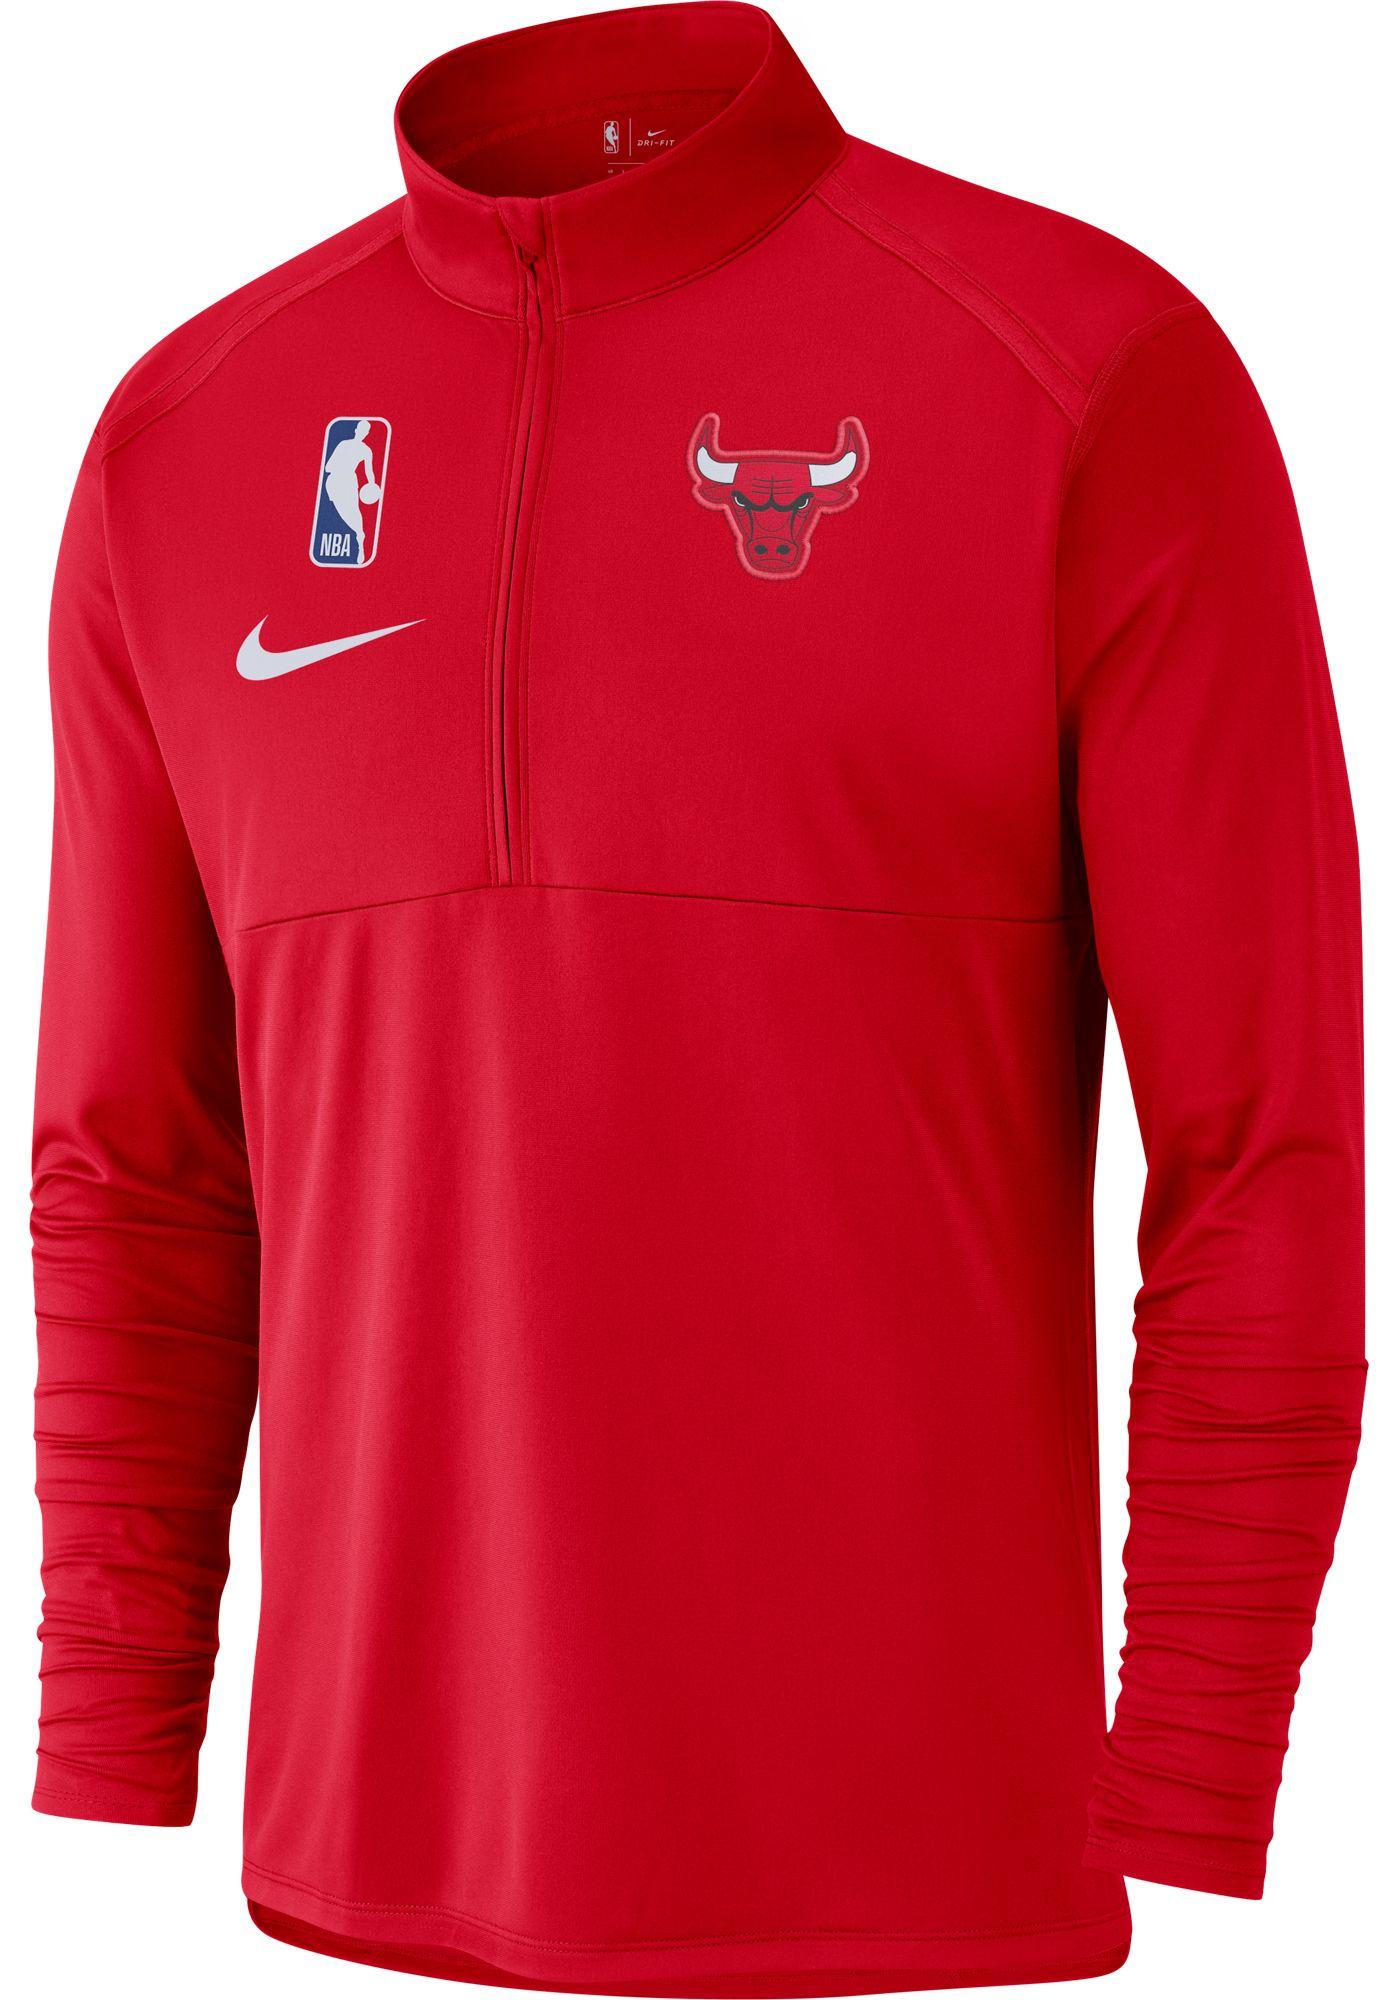 Nike Men's Chicago Bulls Dri-FIT Element Half-Zip Pullover